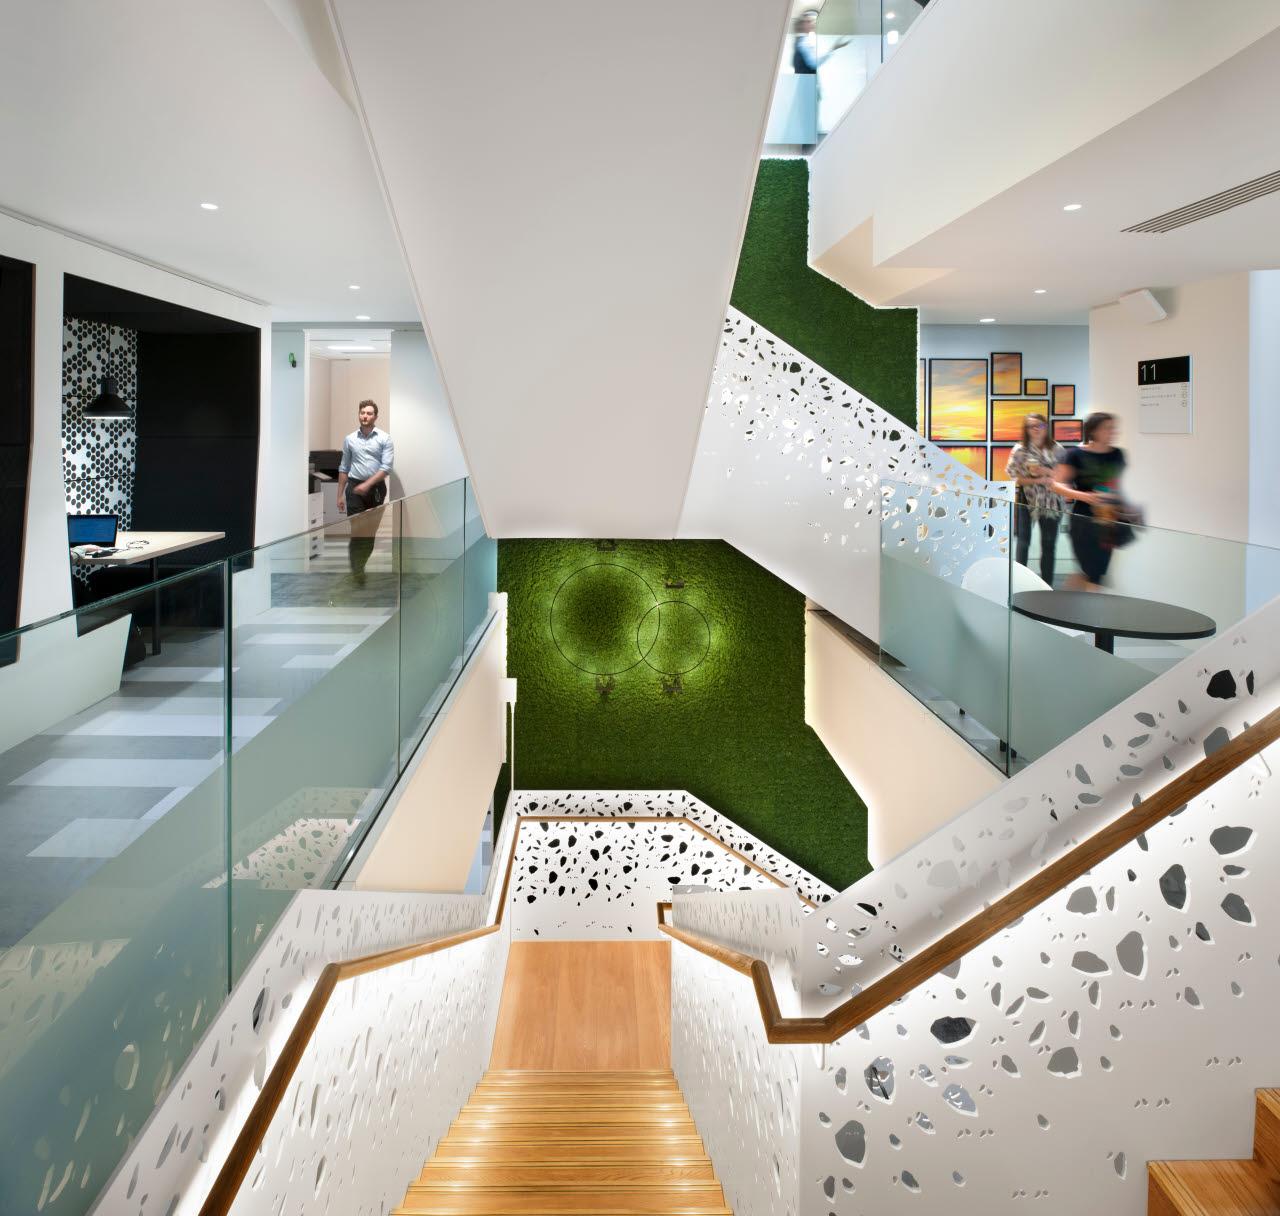 Deloitte interior building